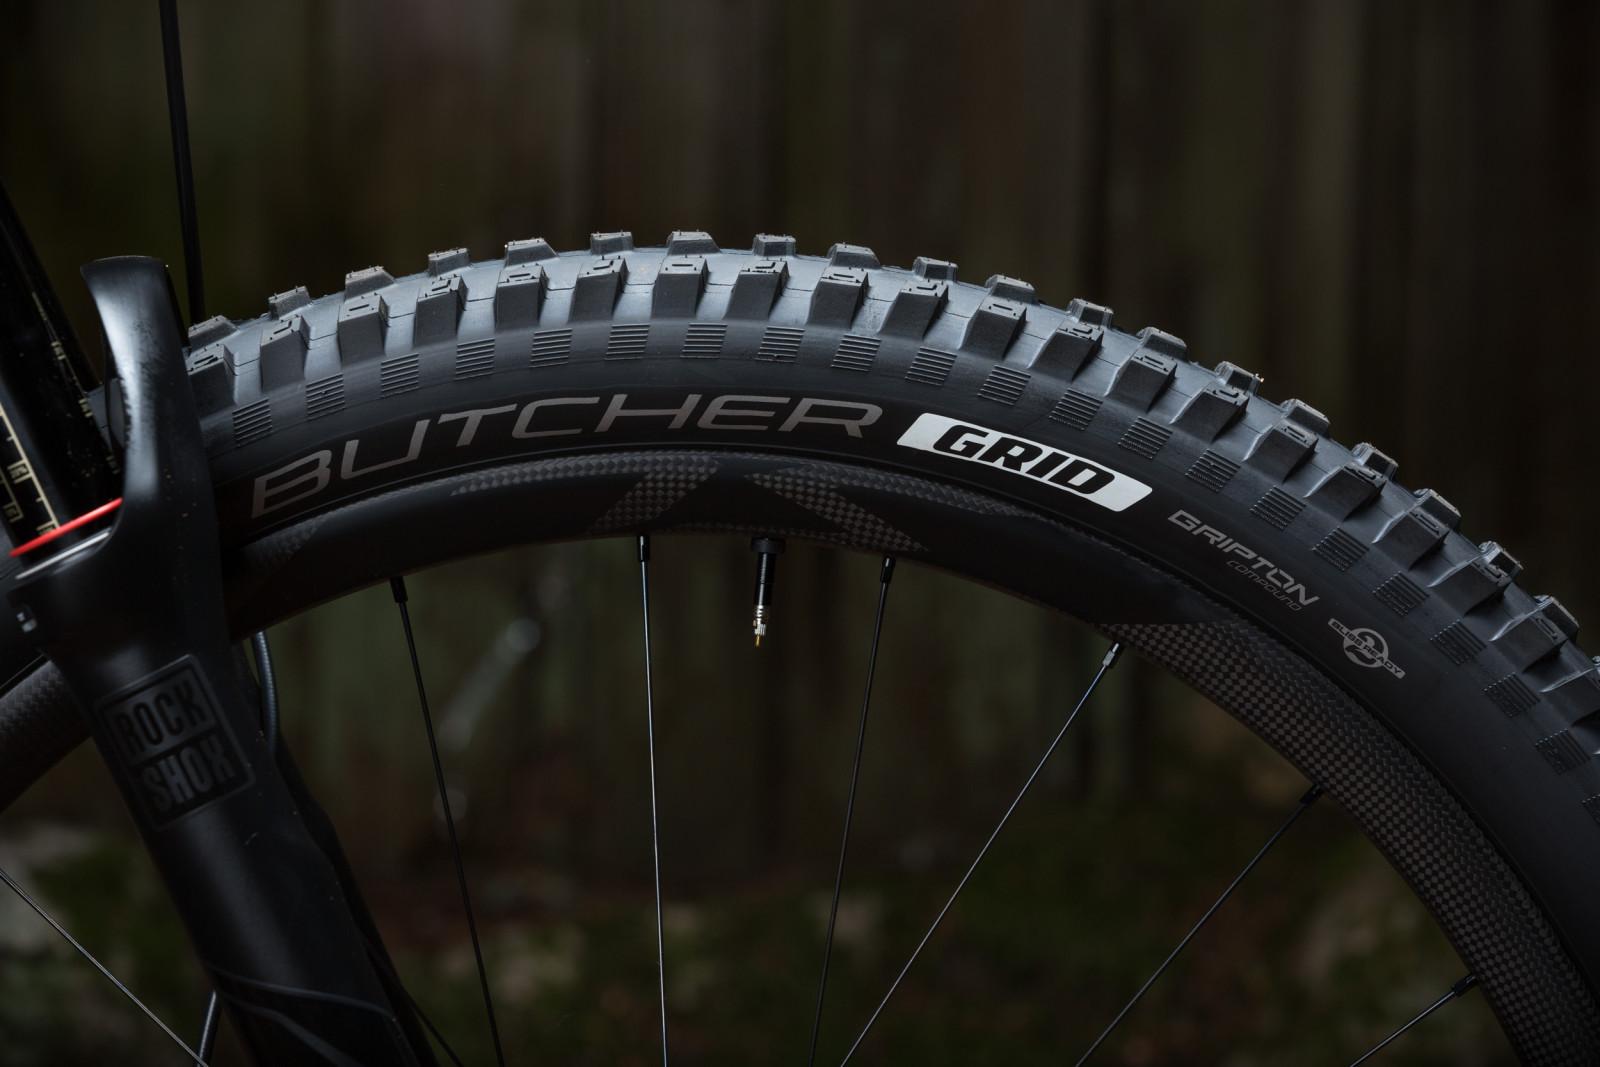 2016 Specialized Enduro Launch - Tire: Butcher